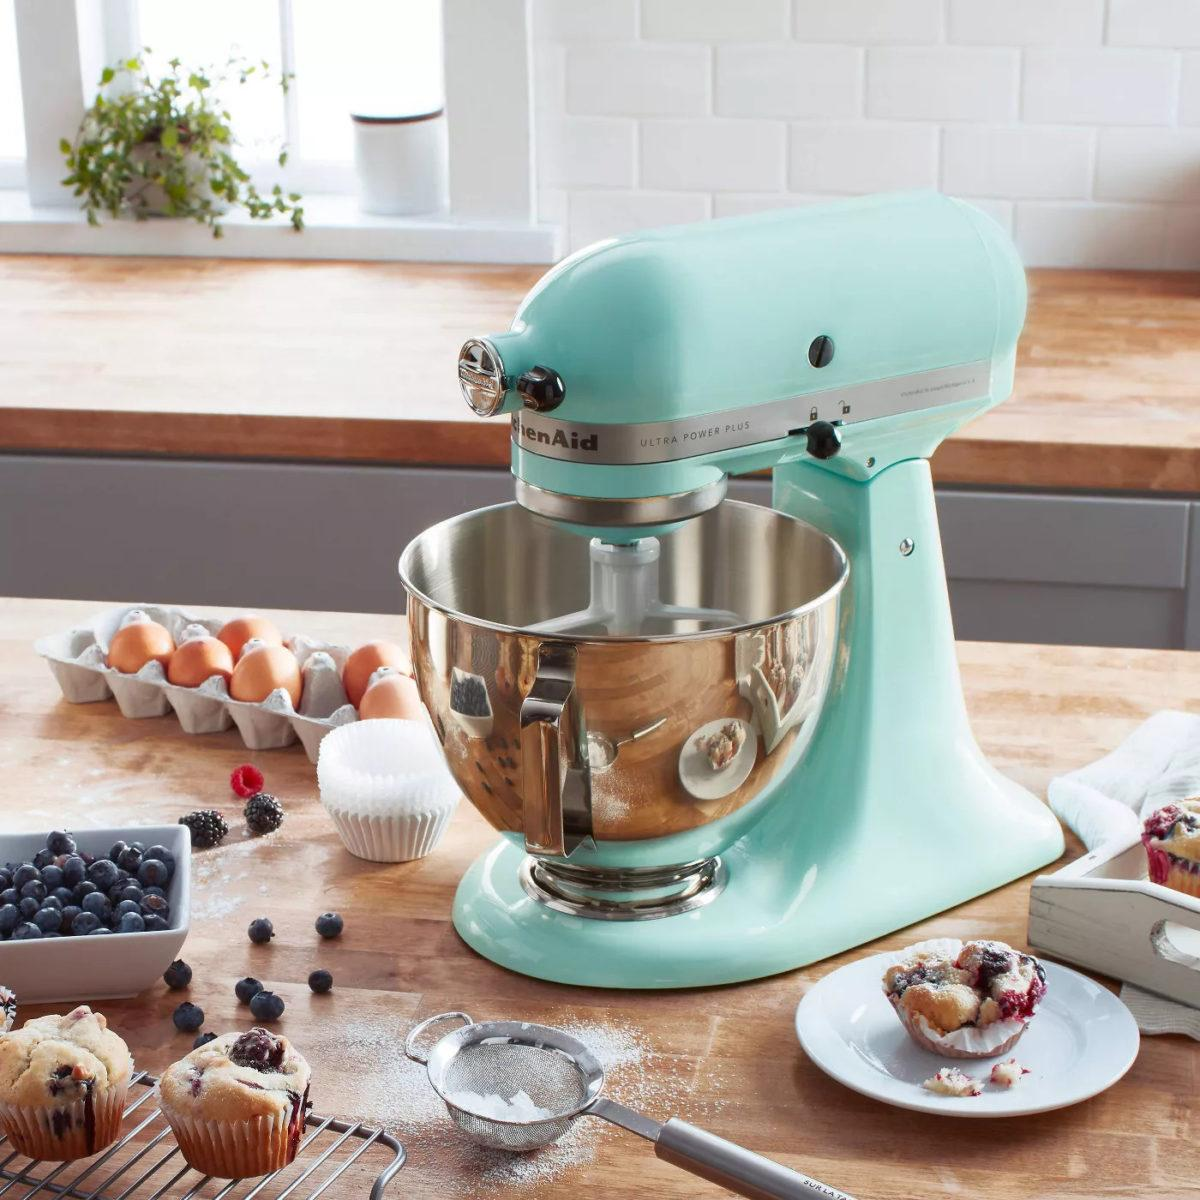 kitchenaid stand mixer appliance